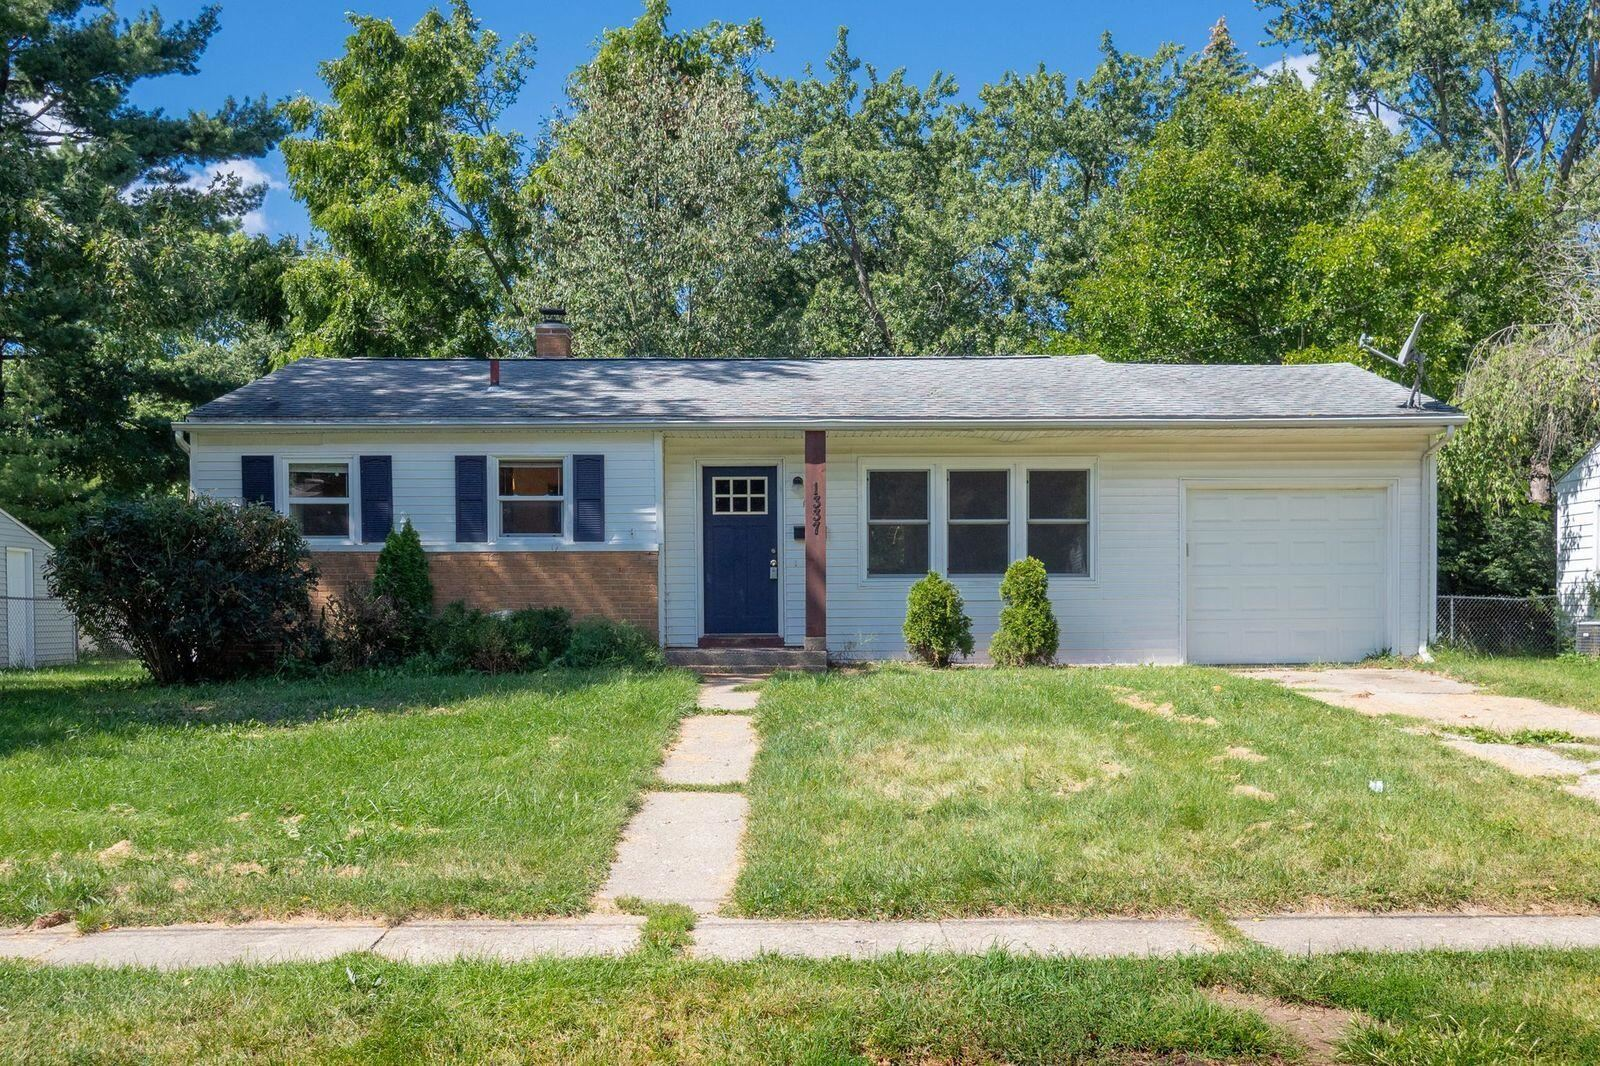 1337 Manor Street, Kalamazoo, MI 49006 - MLS#: 21106795